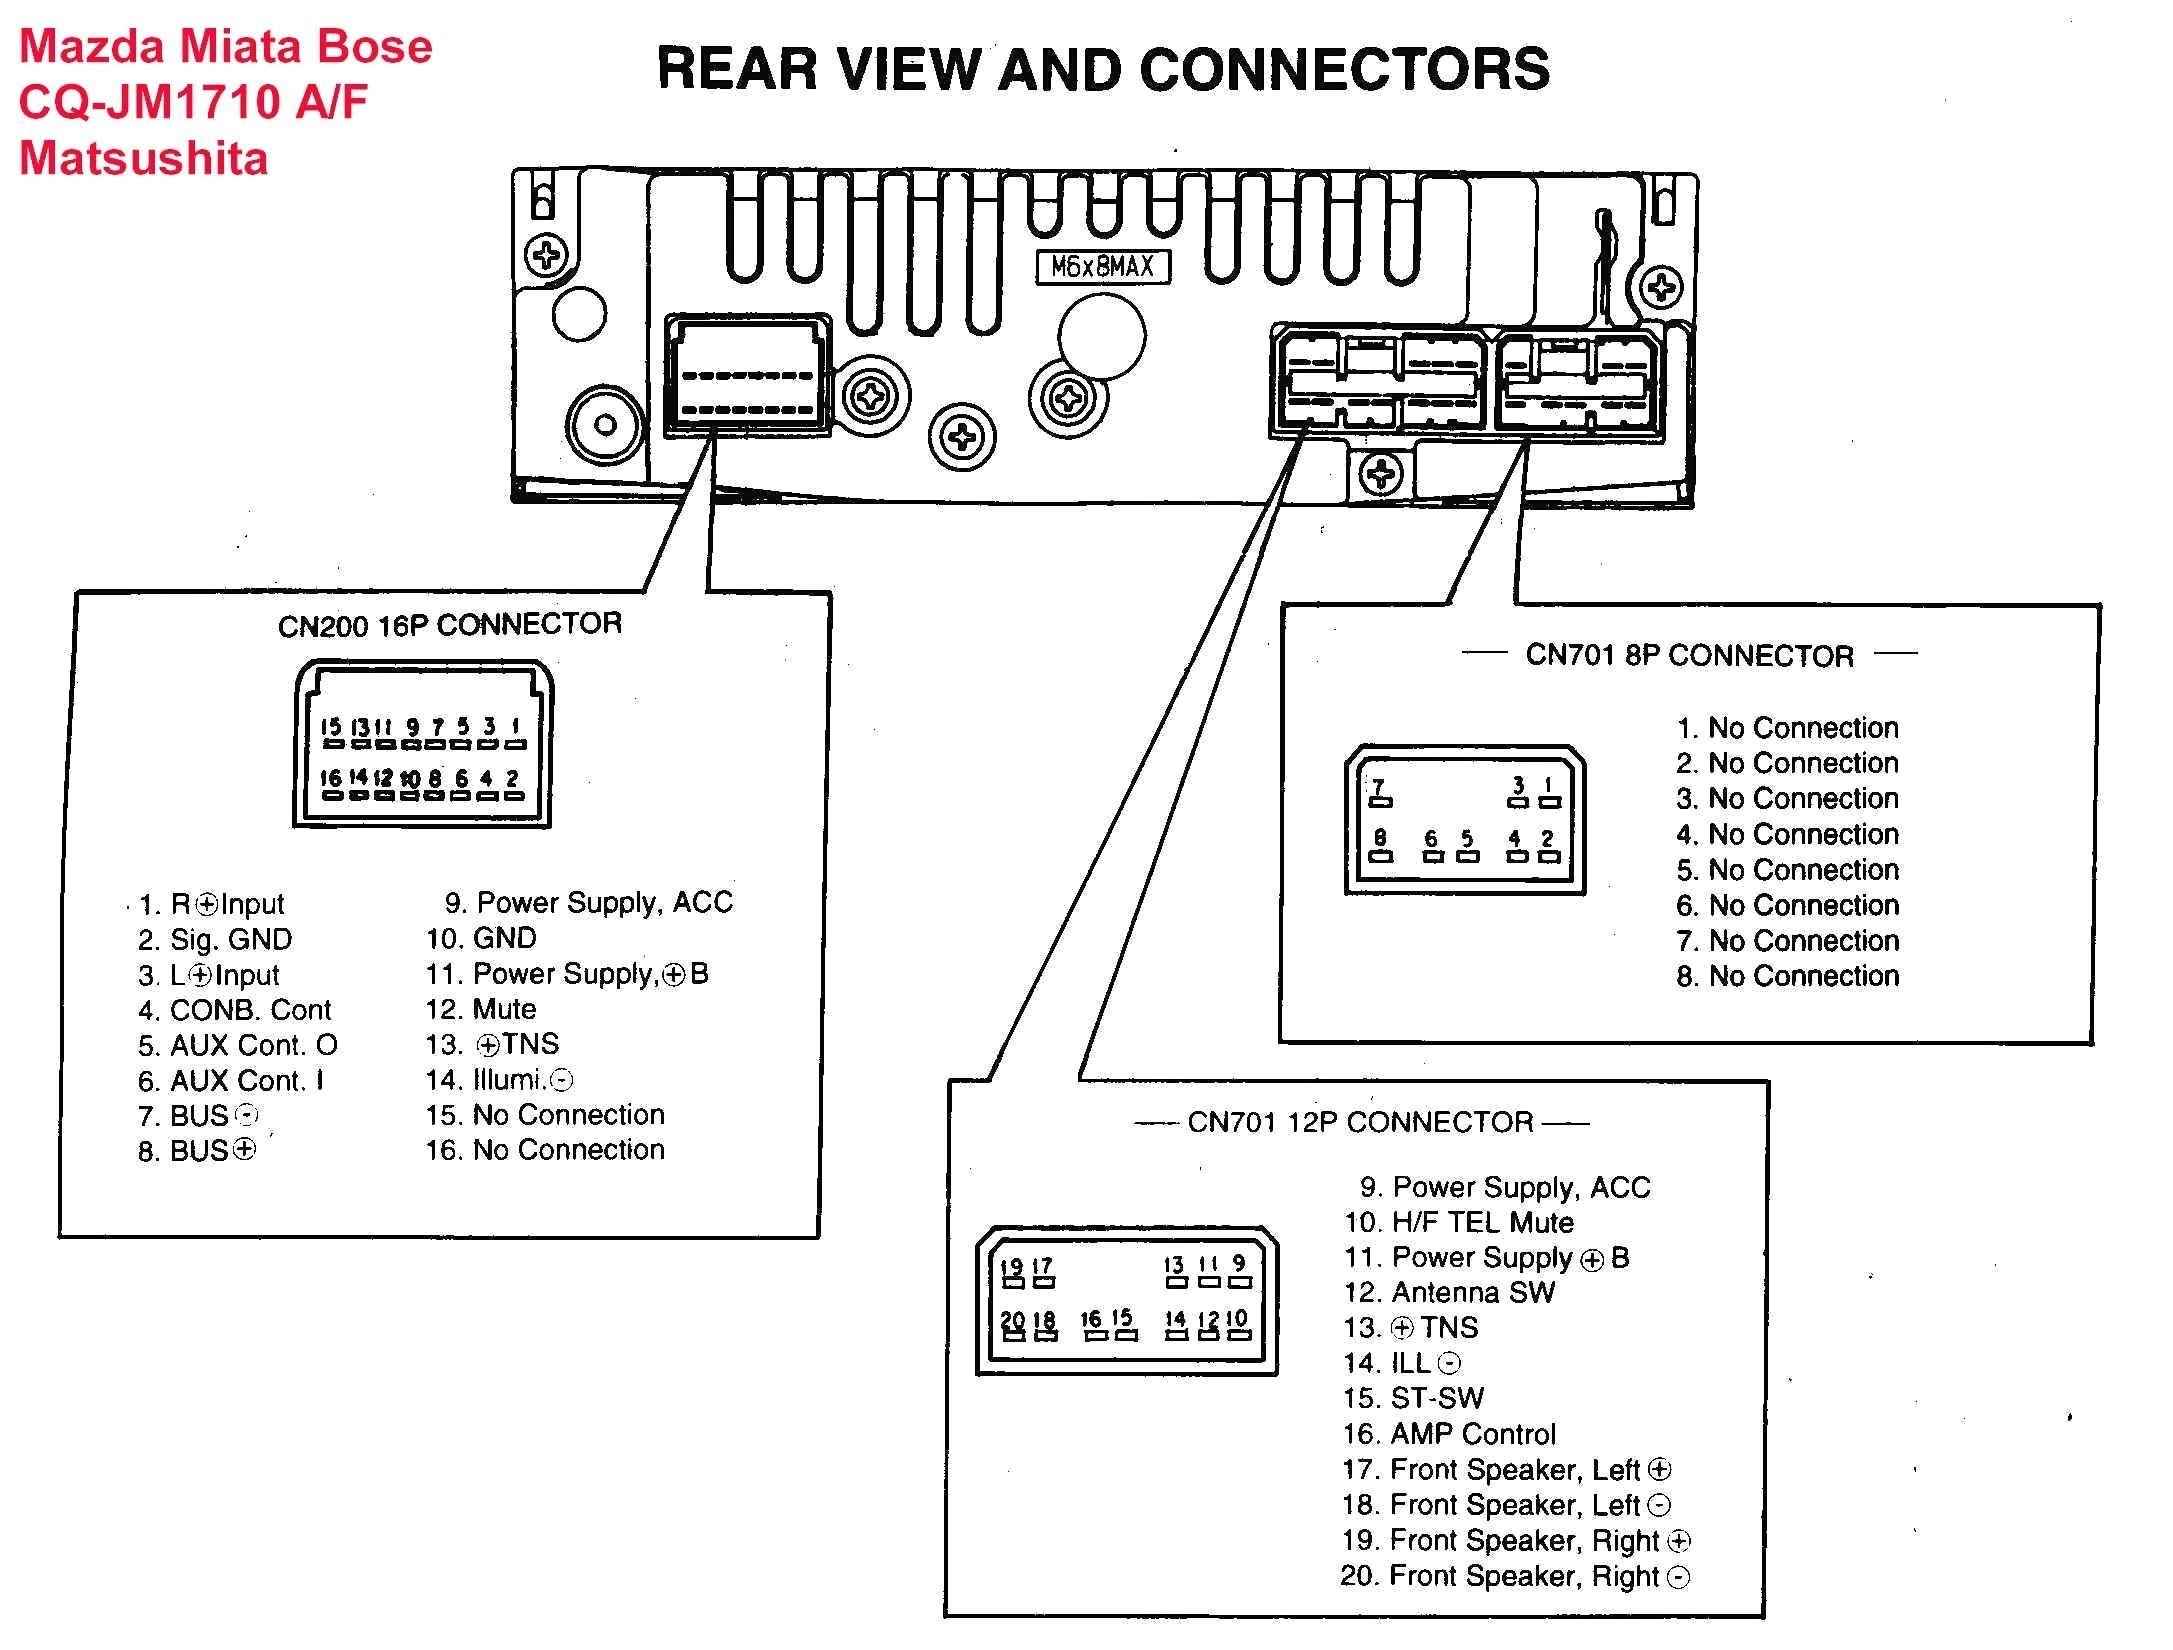 Fujitsu Wiring Diagram Wiring Diagrams Konsult Fujitsu Aou9rl2 Wiring Diagram Fujitsu Wiring Diagram